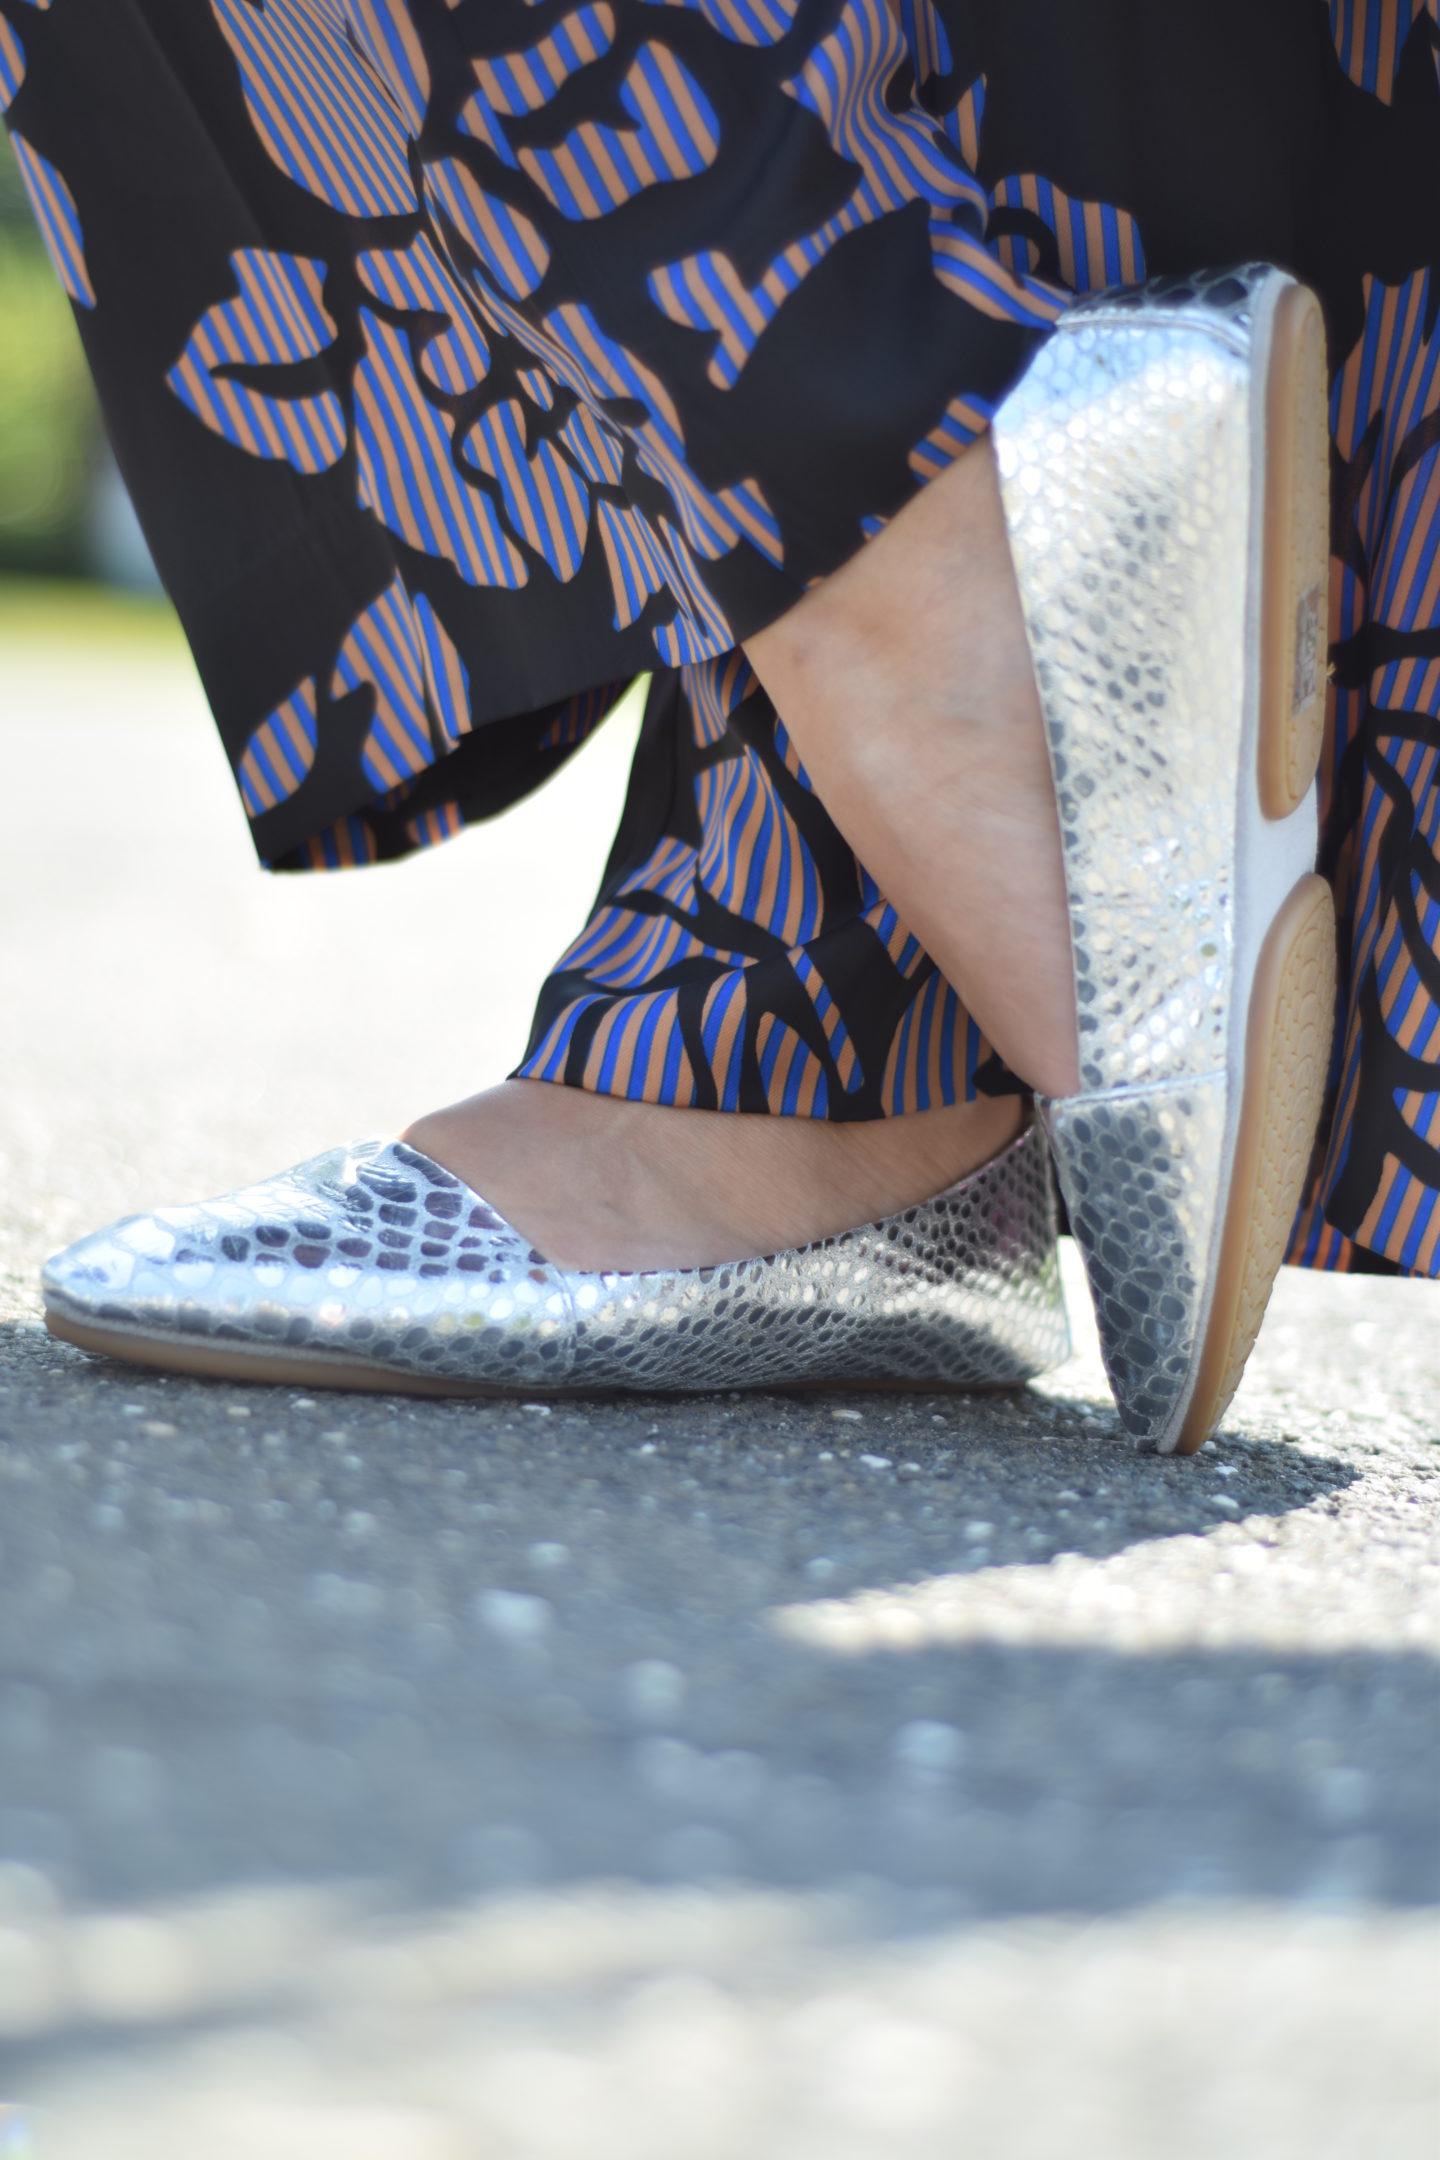 Yosi samra-outfit-style-NYFW-blogger